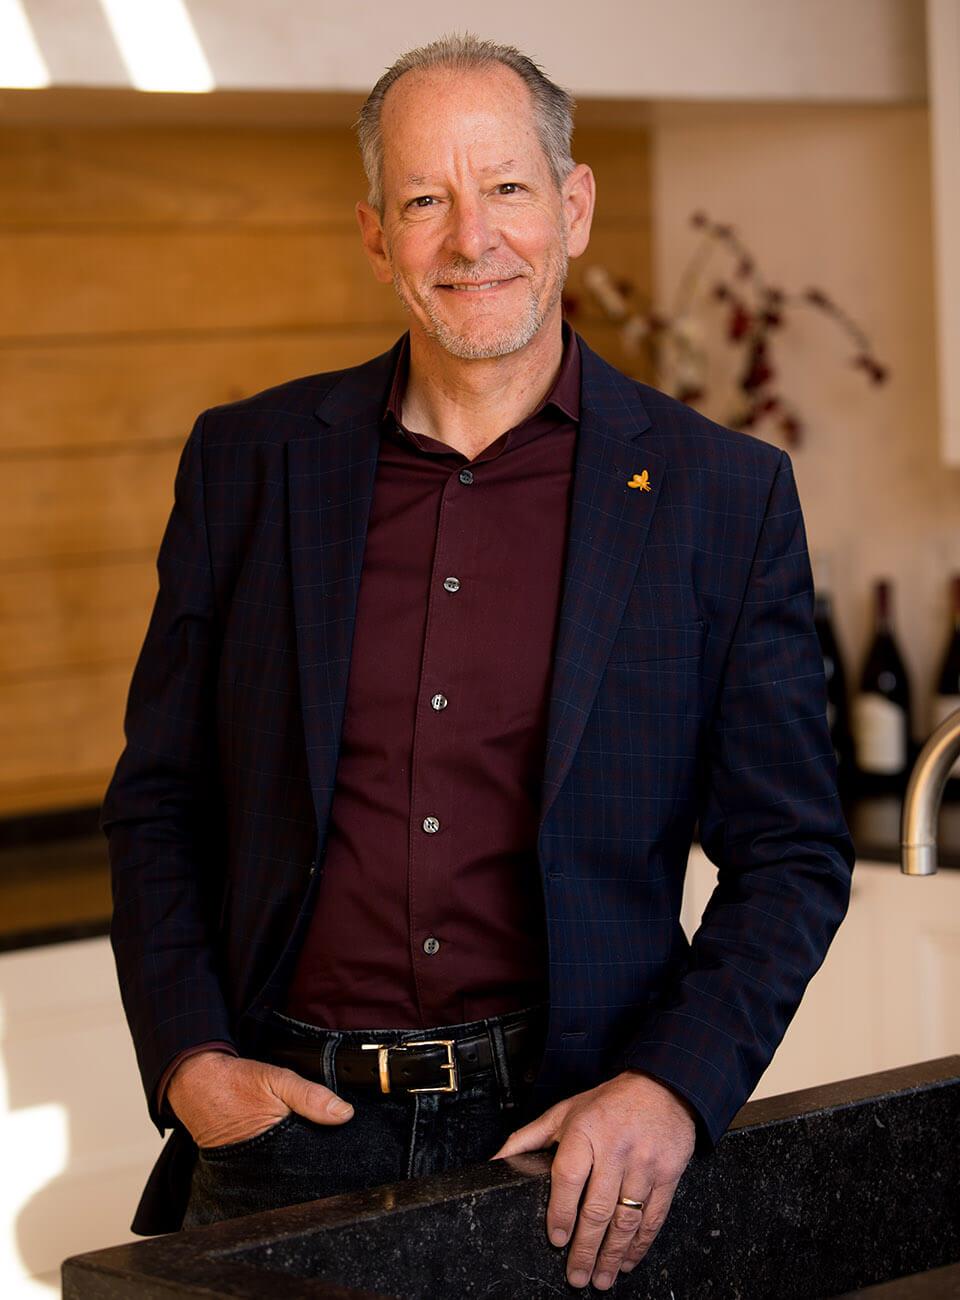 Mark Nettesheim at Classic Kitchens & Designs in Monterey, CA